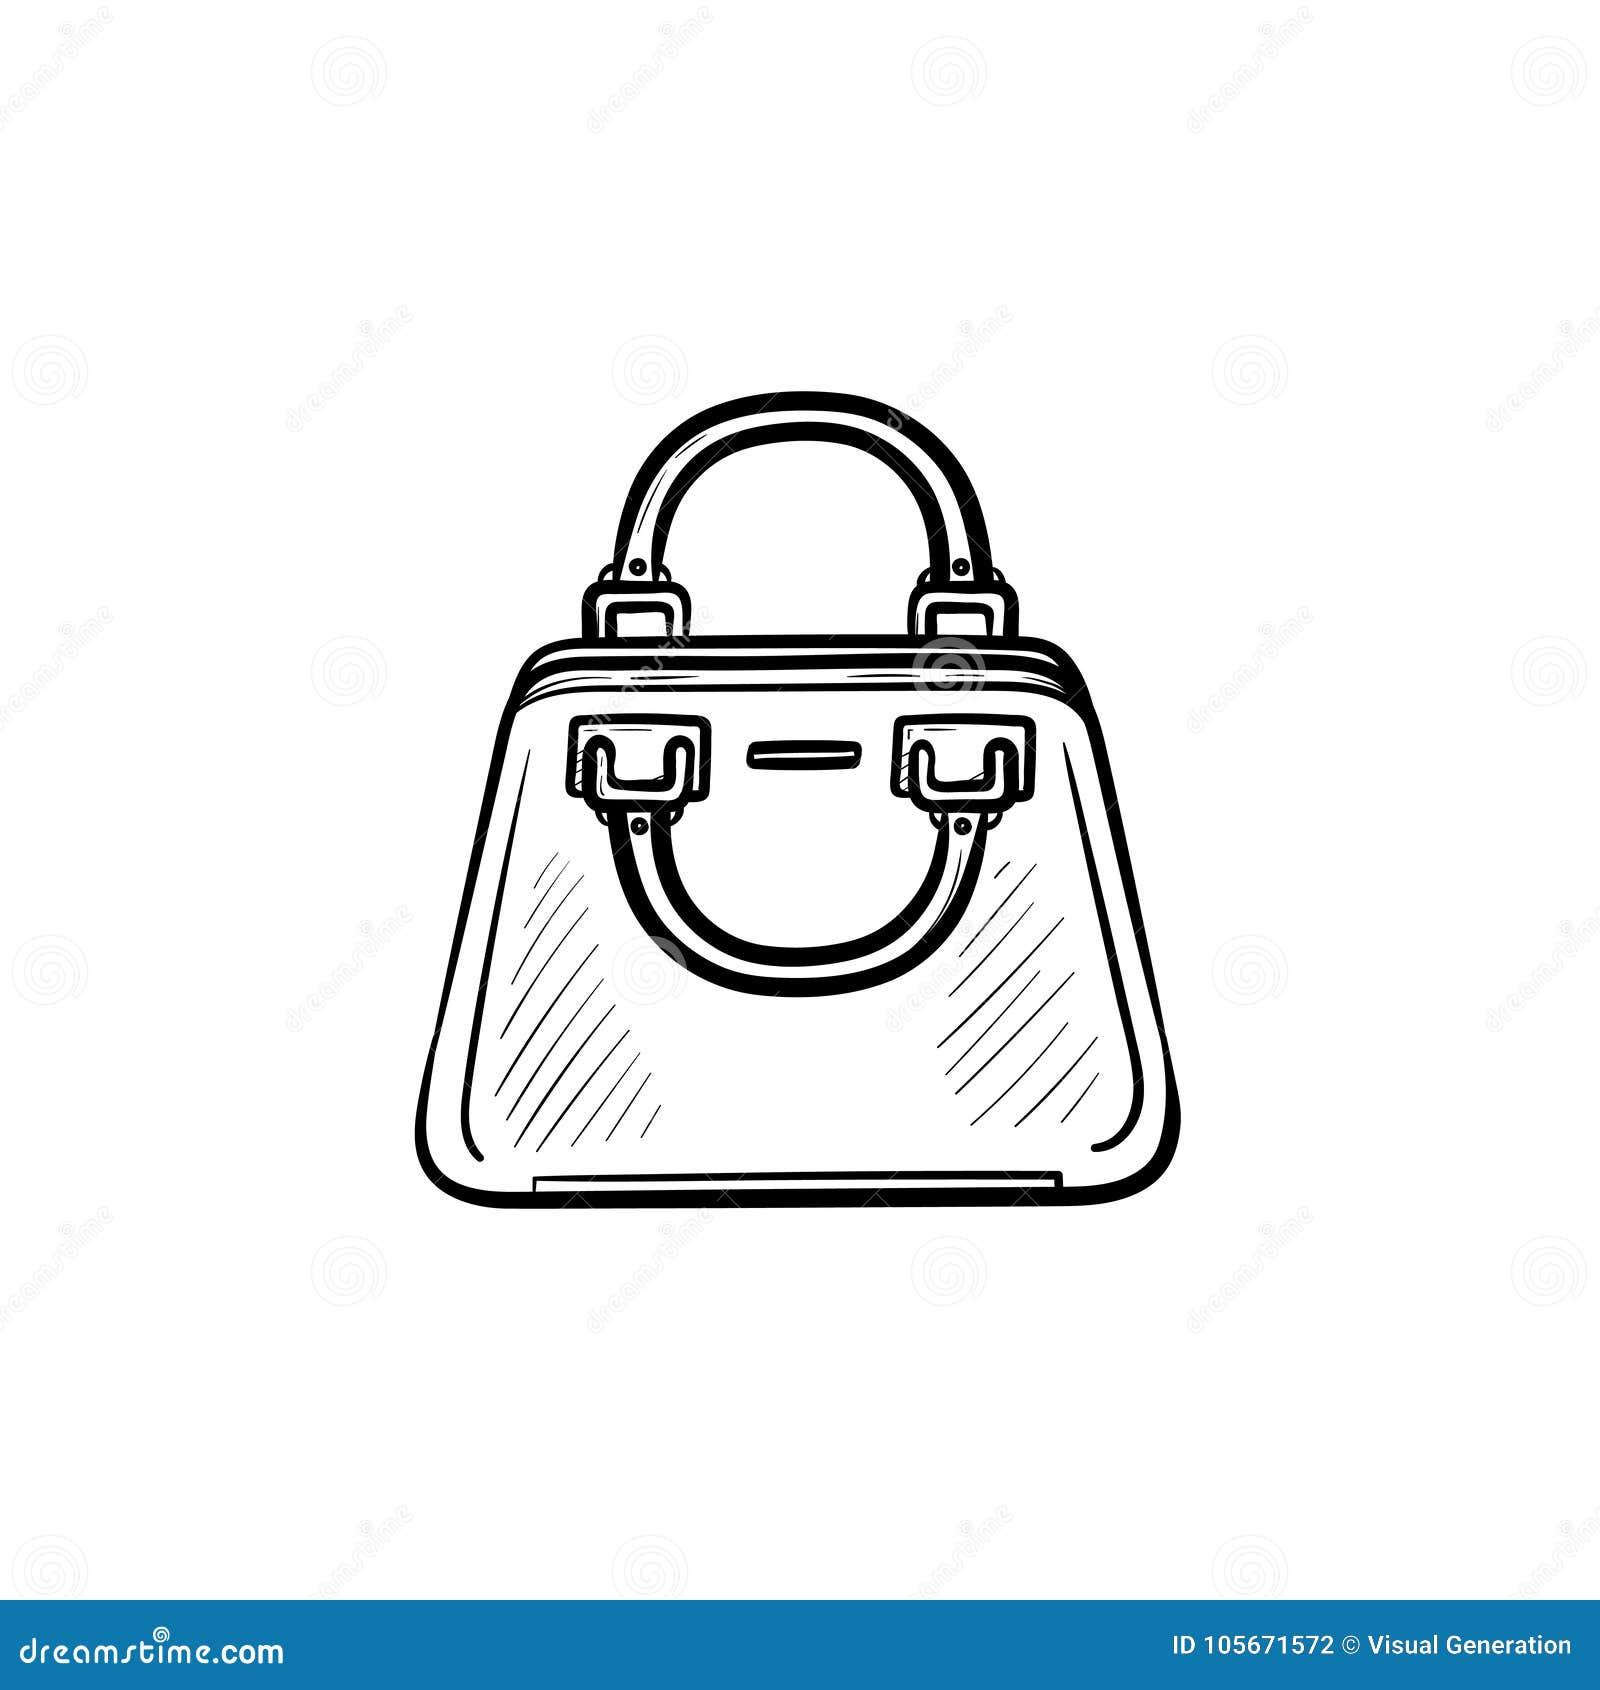 Female Handbag Hand Drawn Sketch Icon Stock Vector Illustration